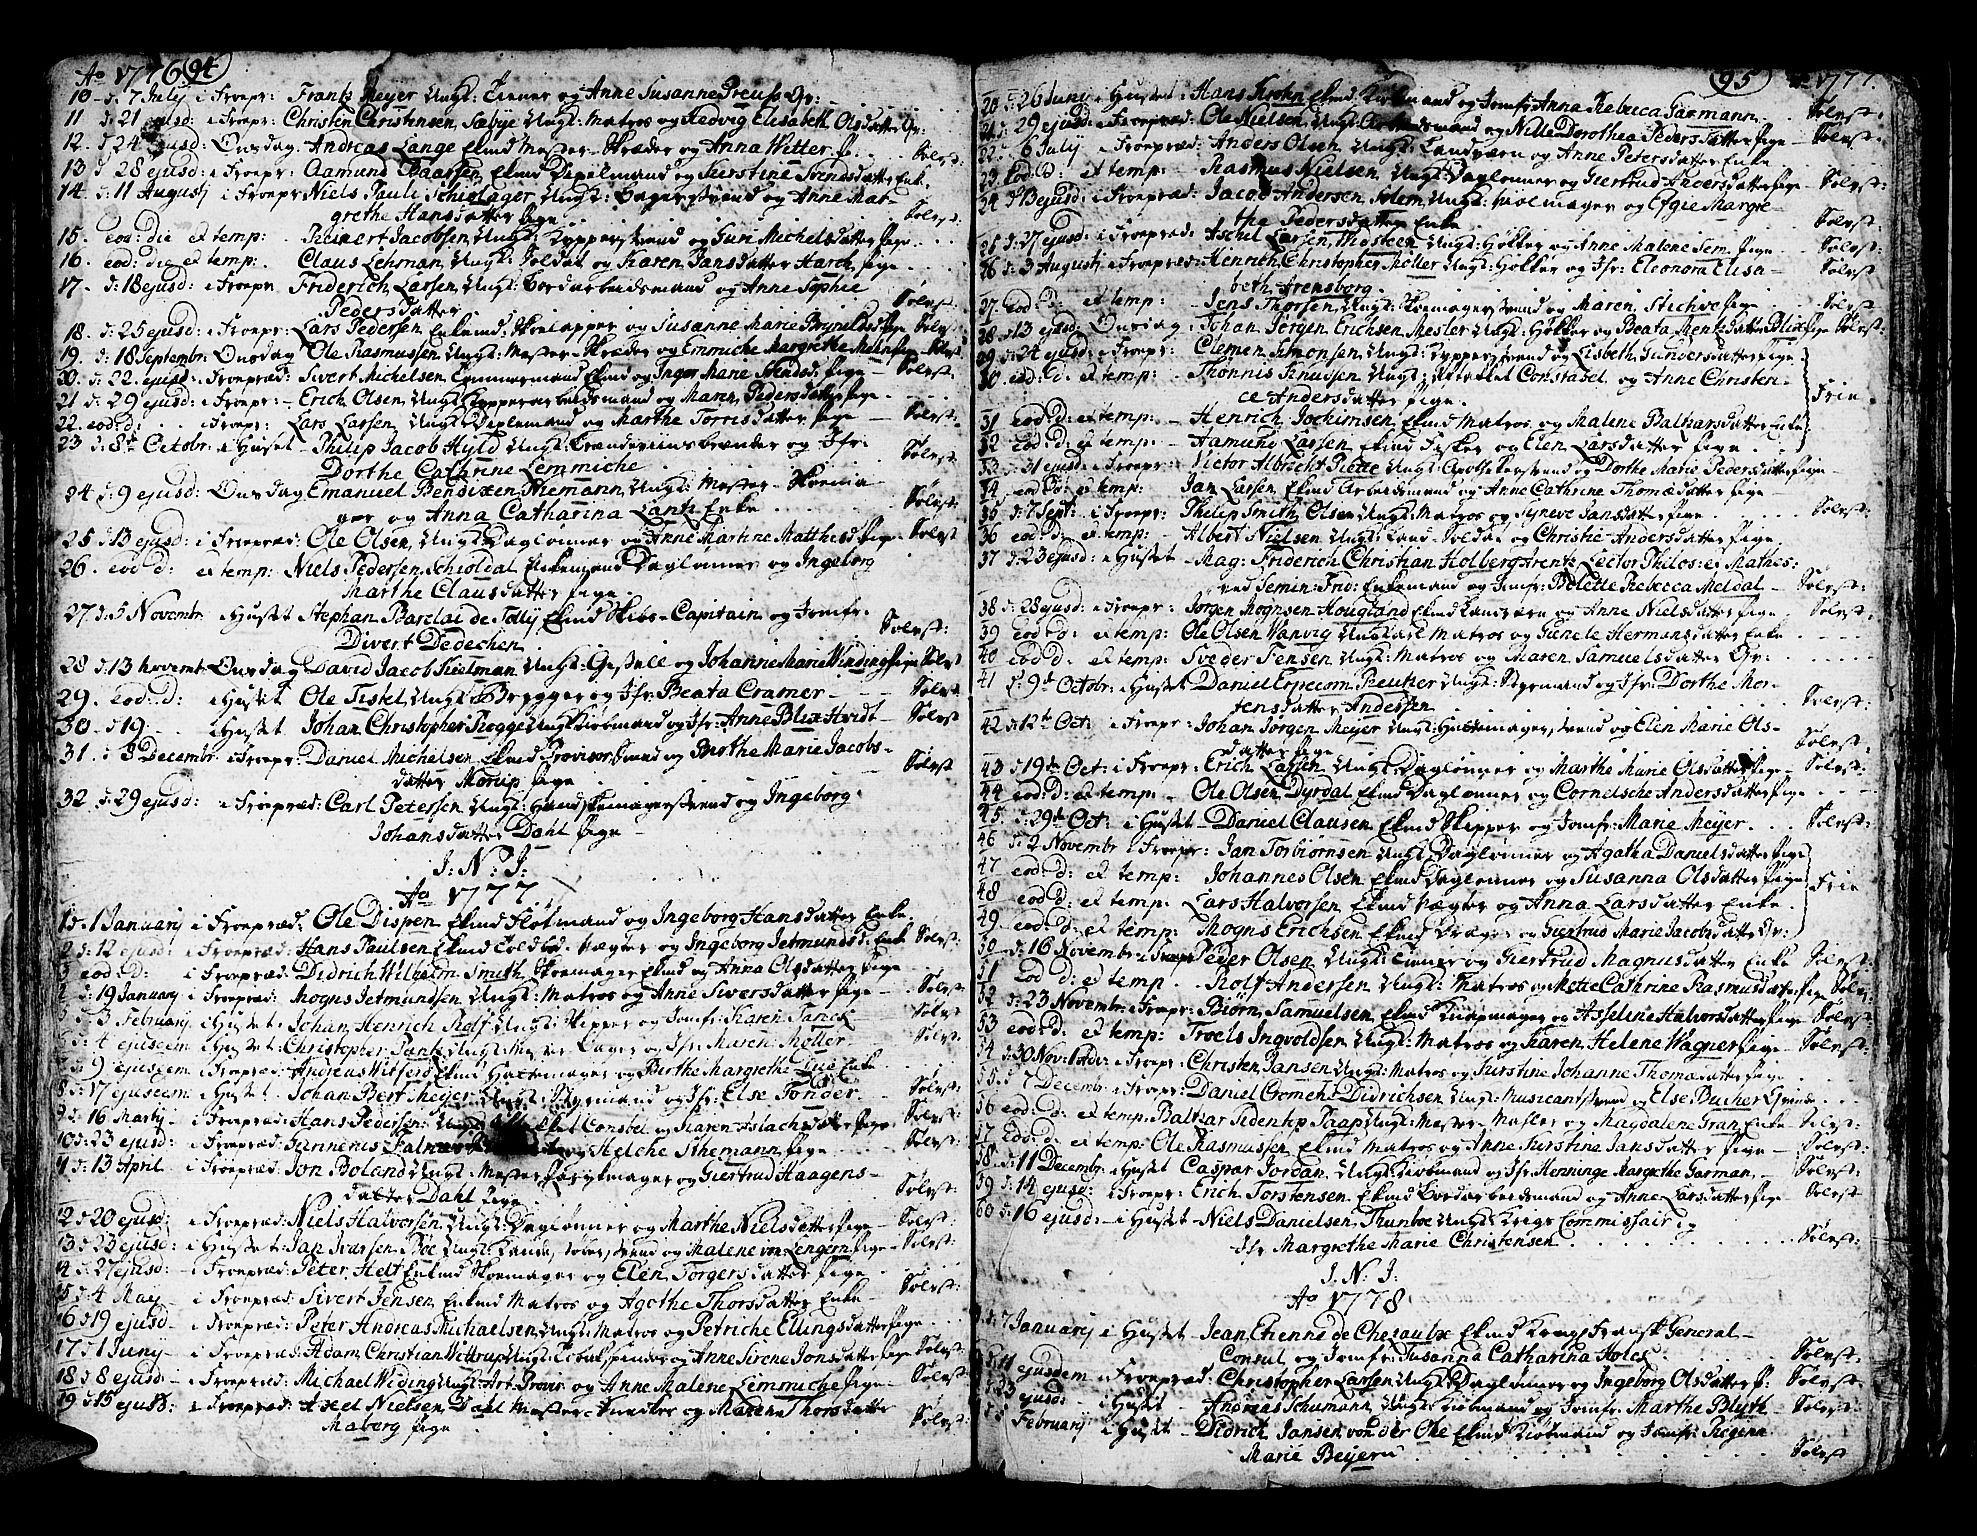 SAB, Domkirken Sokneprestembete, H/Haa/L0007: Ministerialbok nr. A 7, 1725-1826, s. 94-95